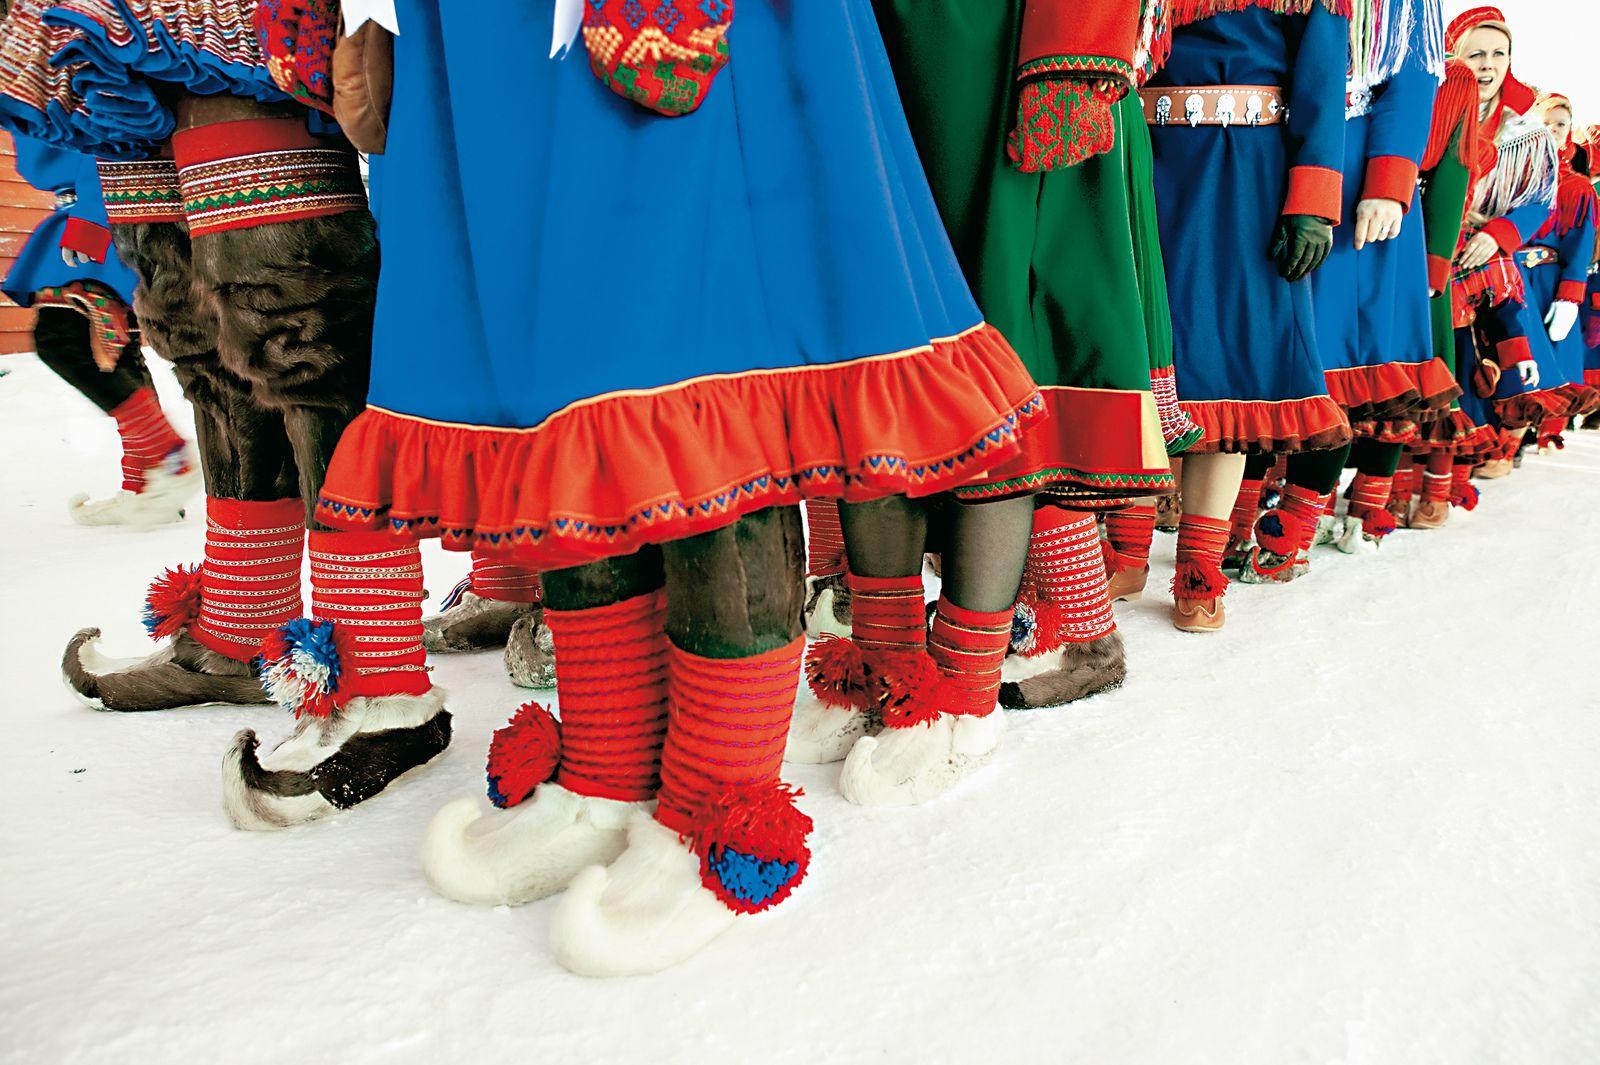 Norske samer. Norwegian Sami | Flickr - Photo Sharing!